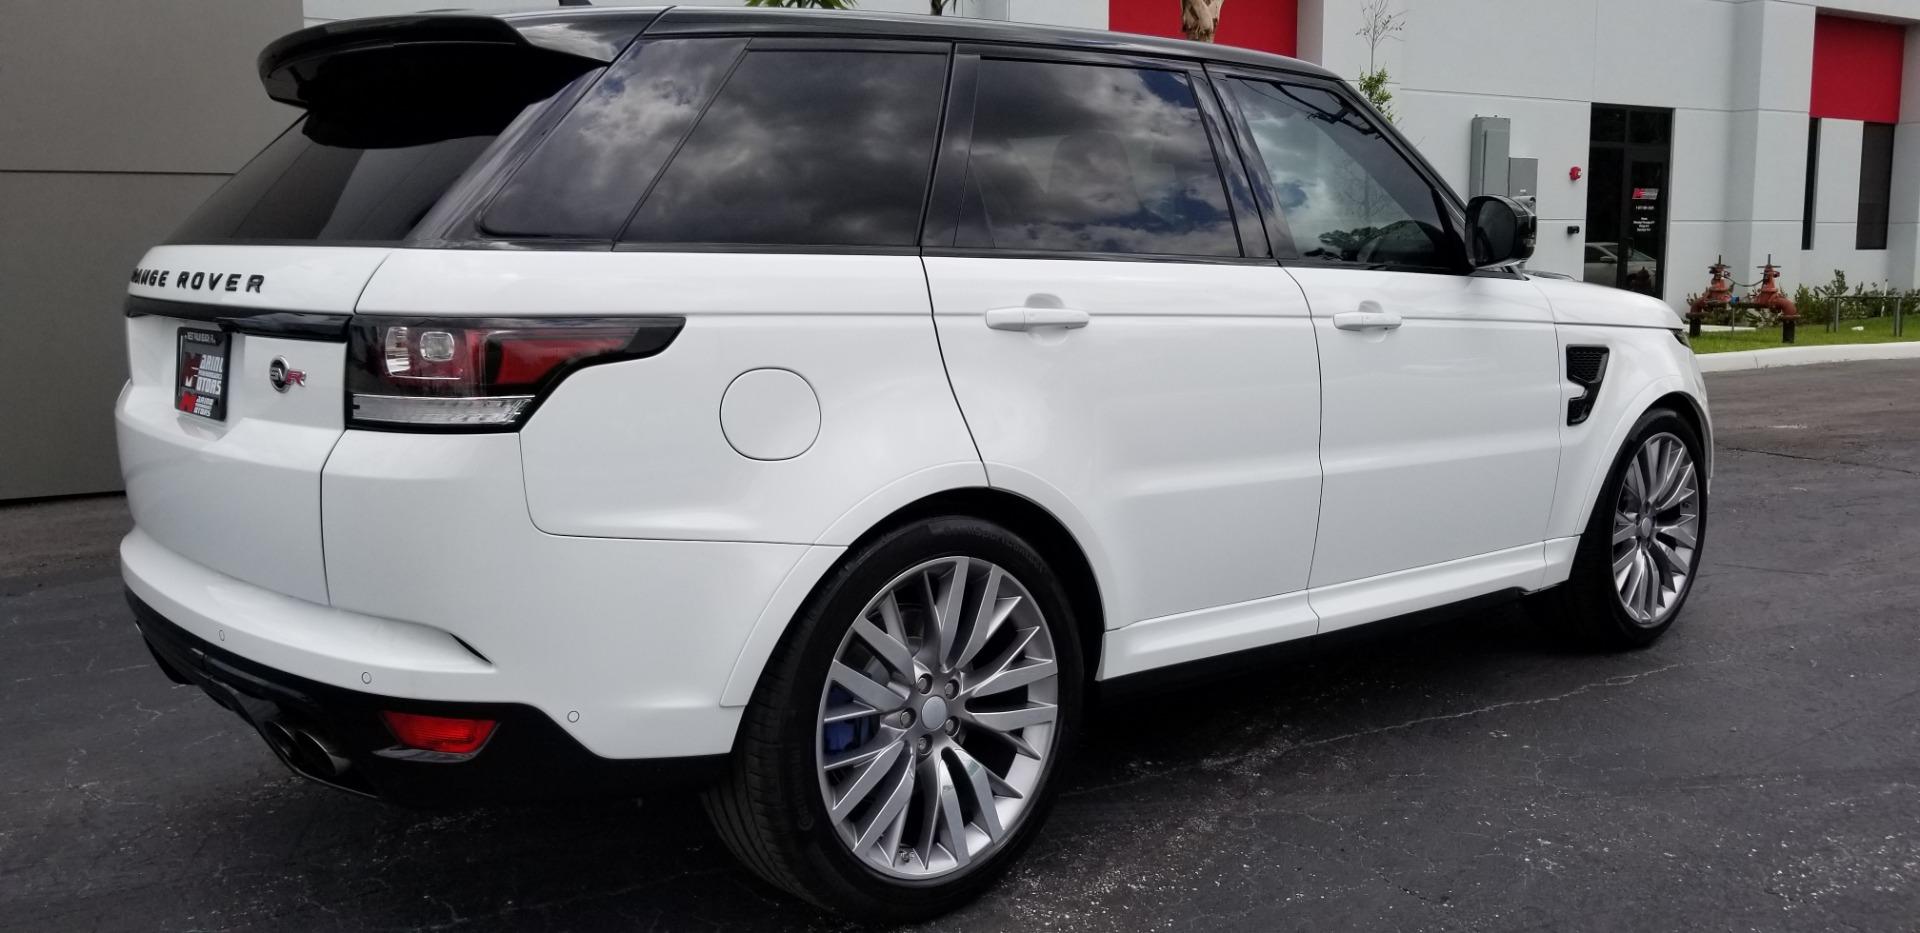 Used-2016-Land-Rover-Range-Rover-Sport-SVR